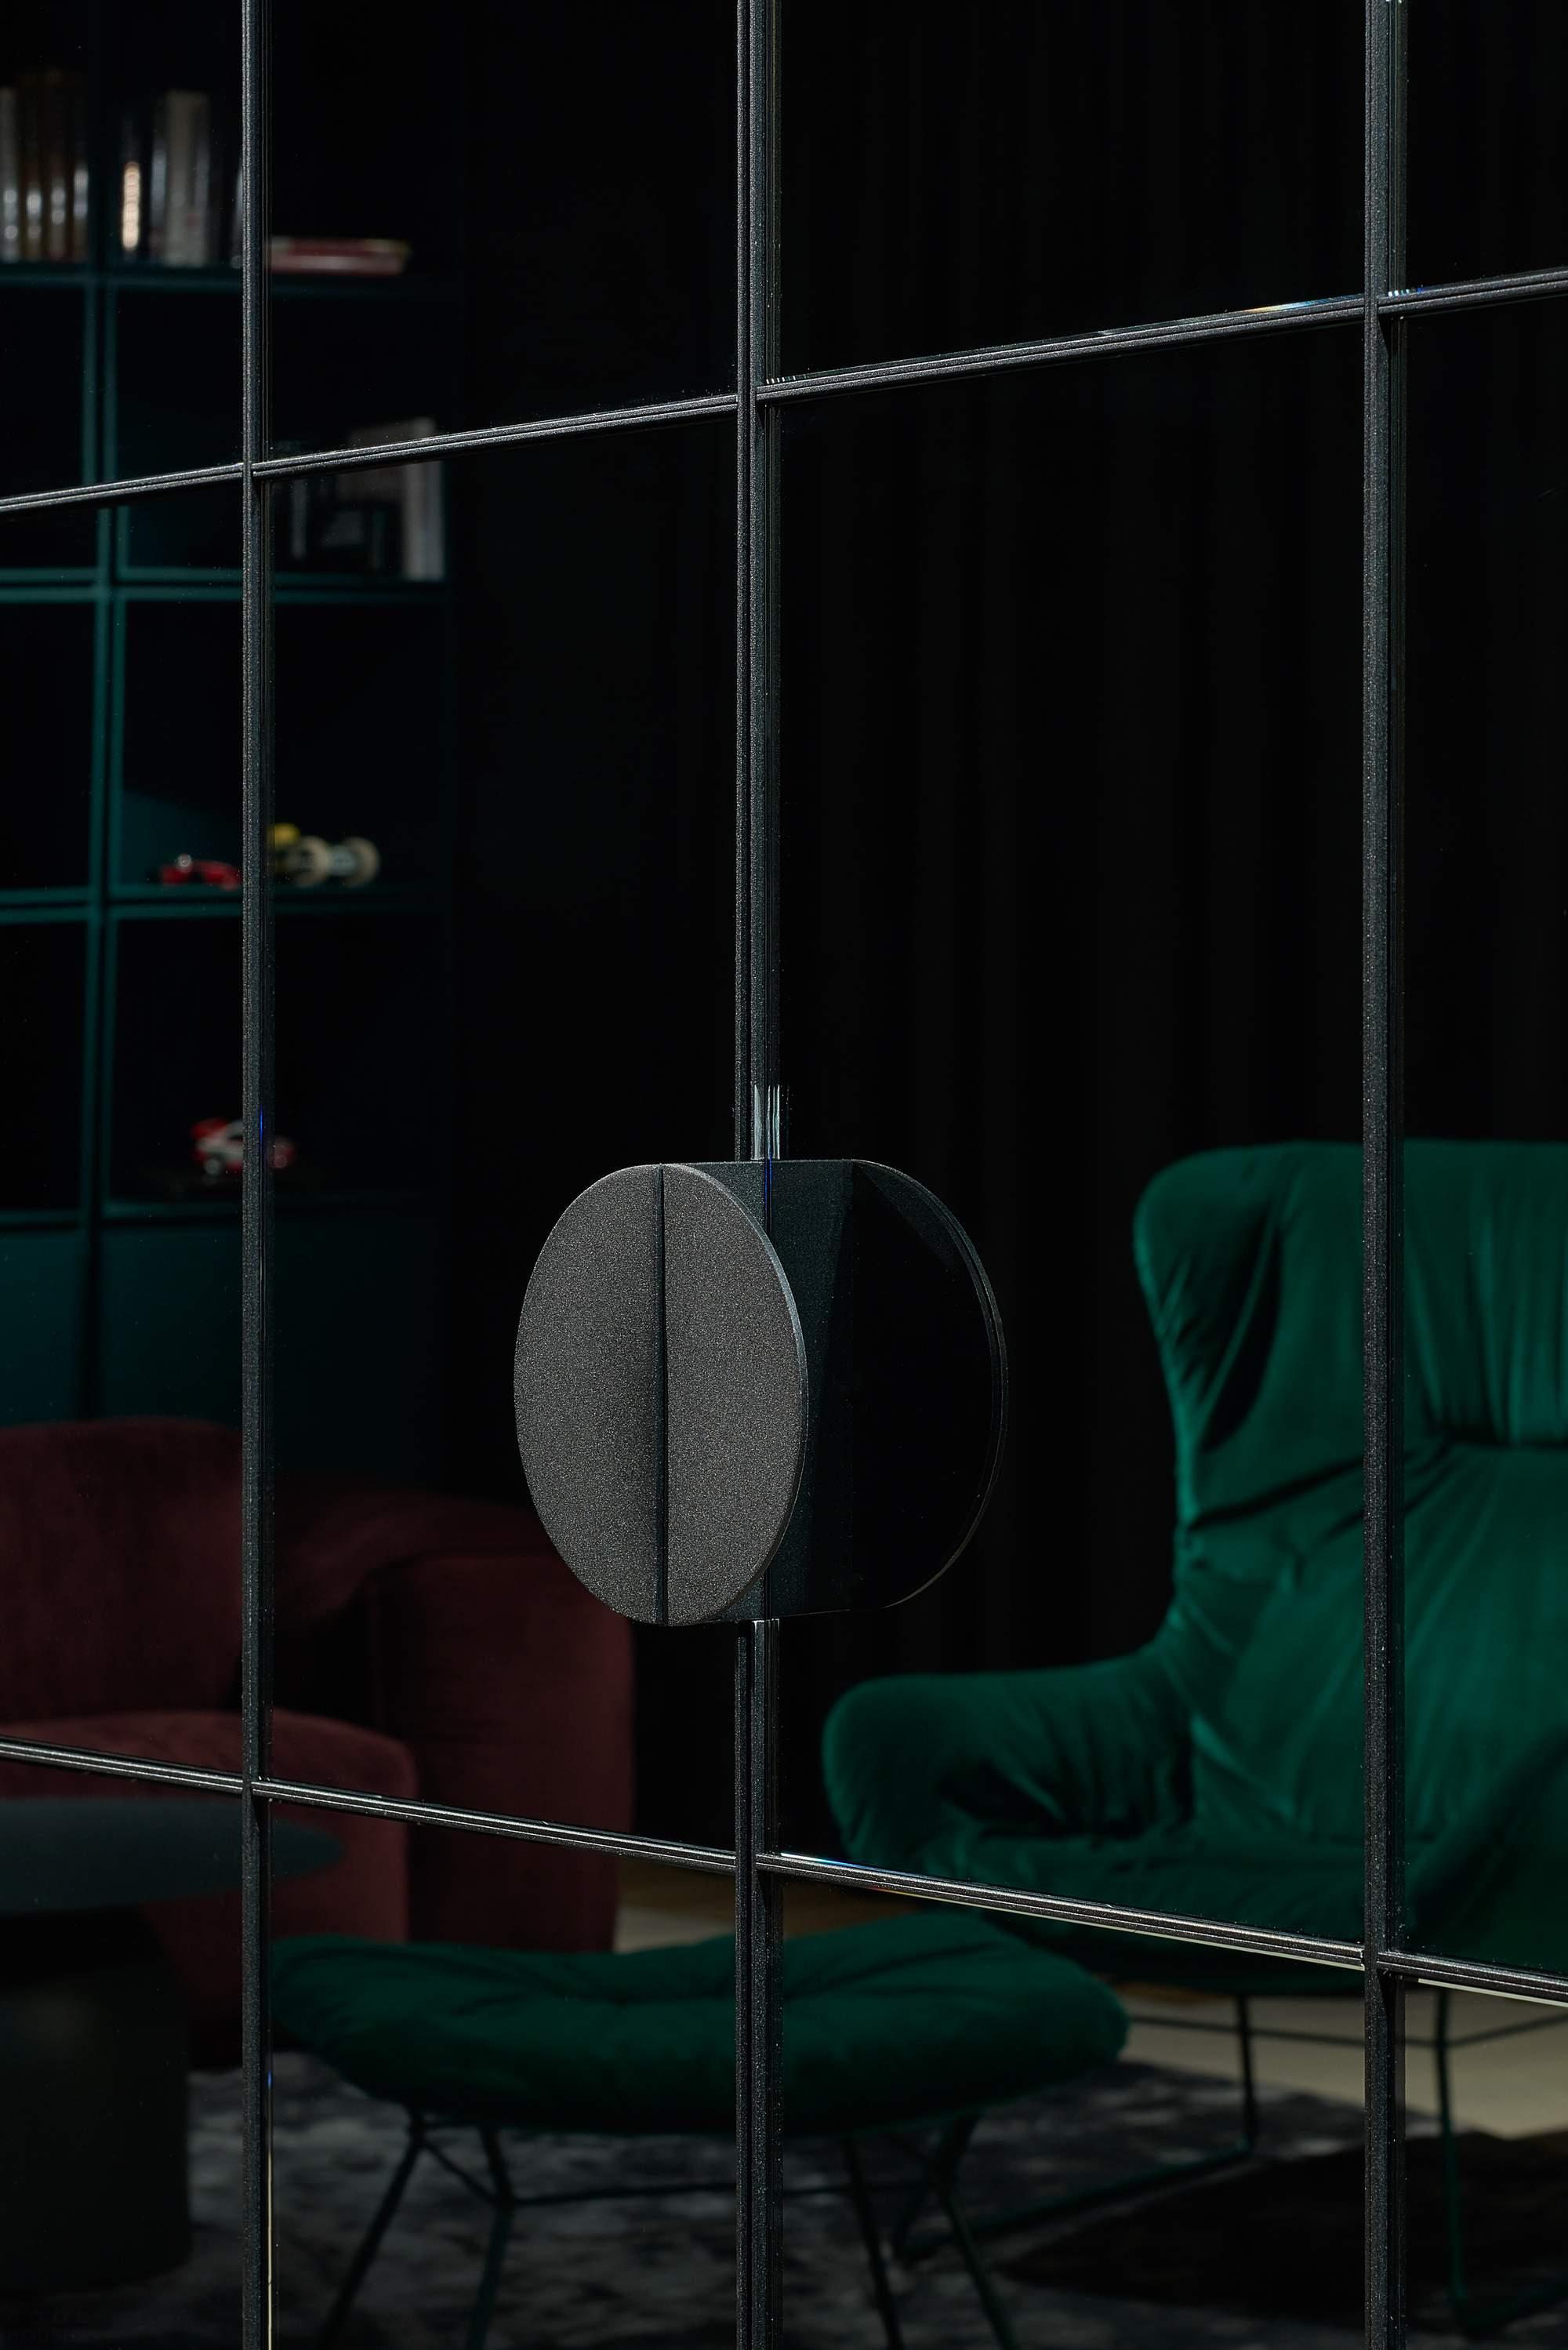 Экстравагантная «Квартира в черном» от HEIMA architects, Литва